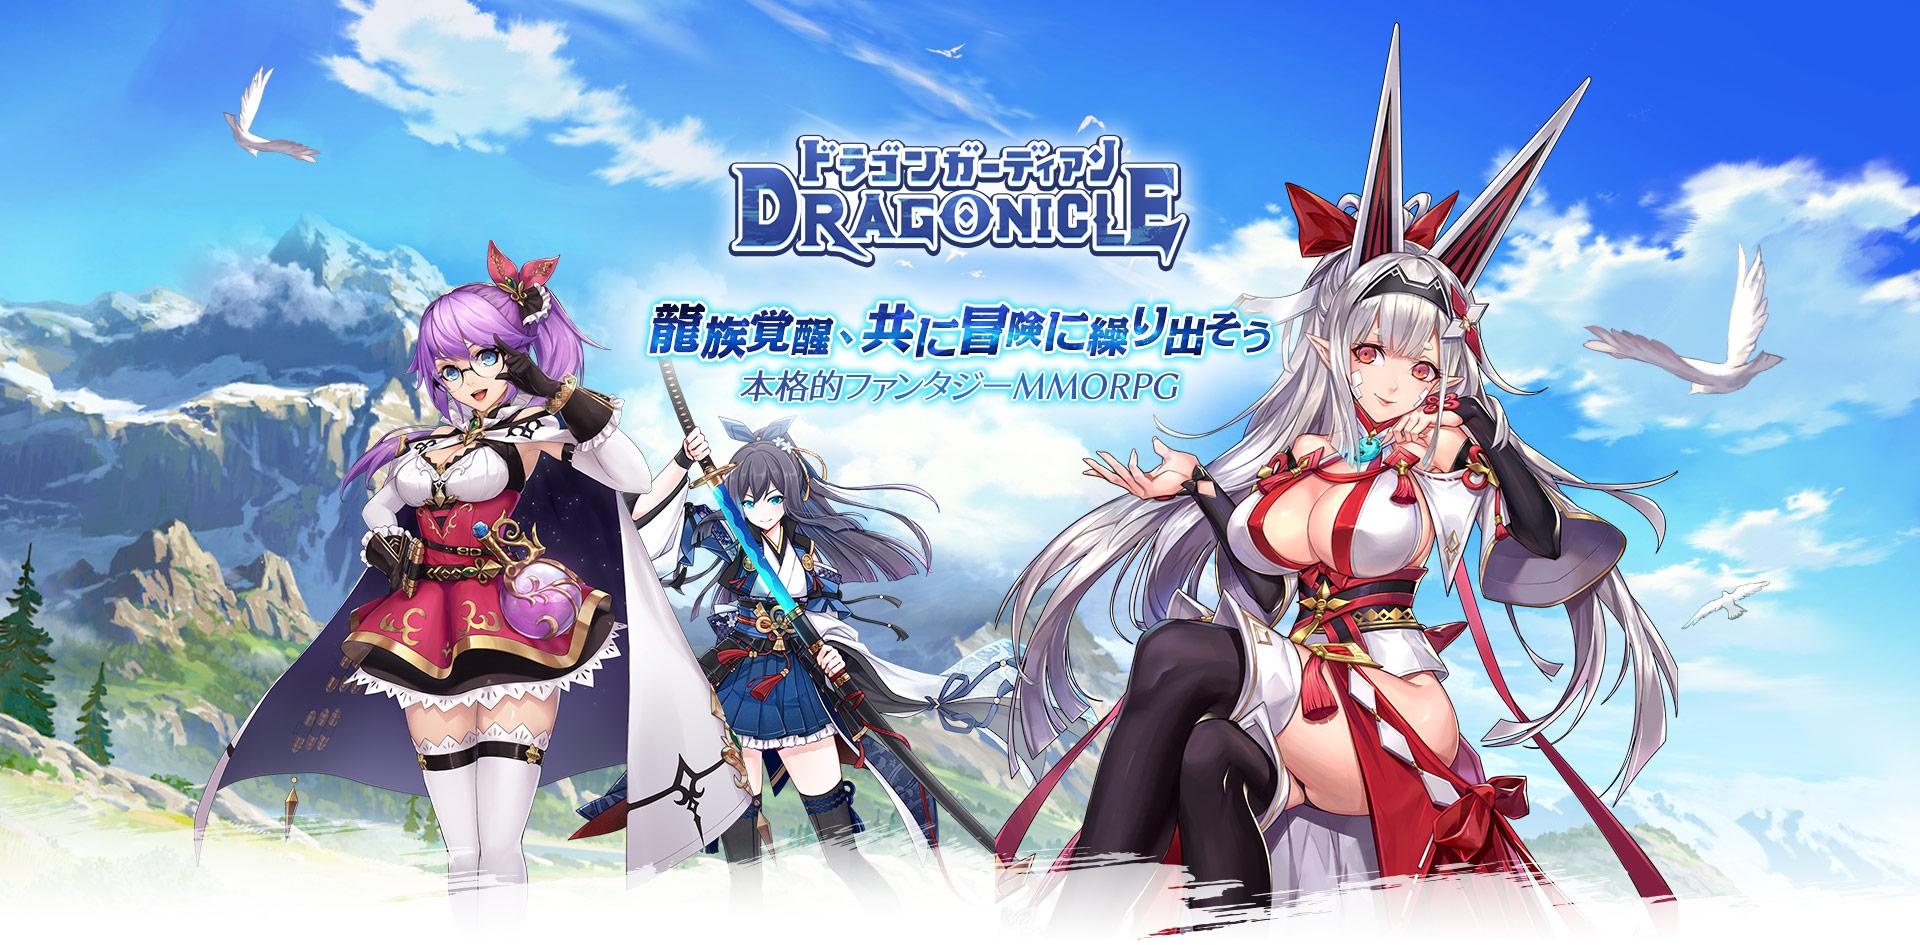 Dragonicle:ドラゴンガーディアン(ドラガー)